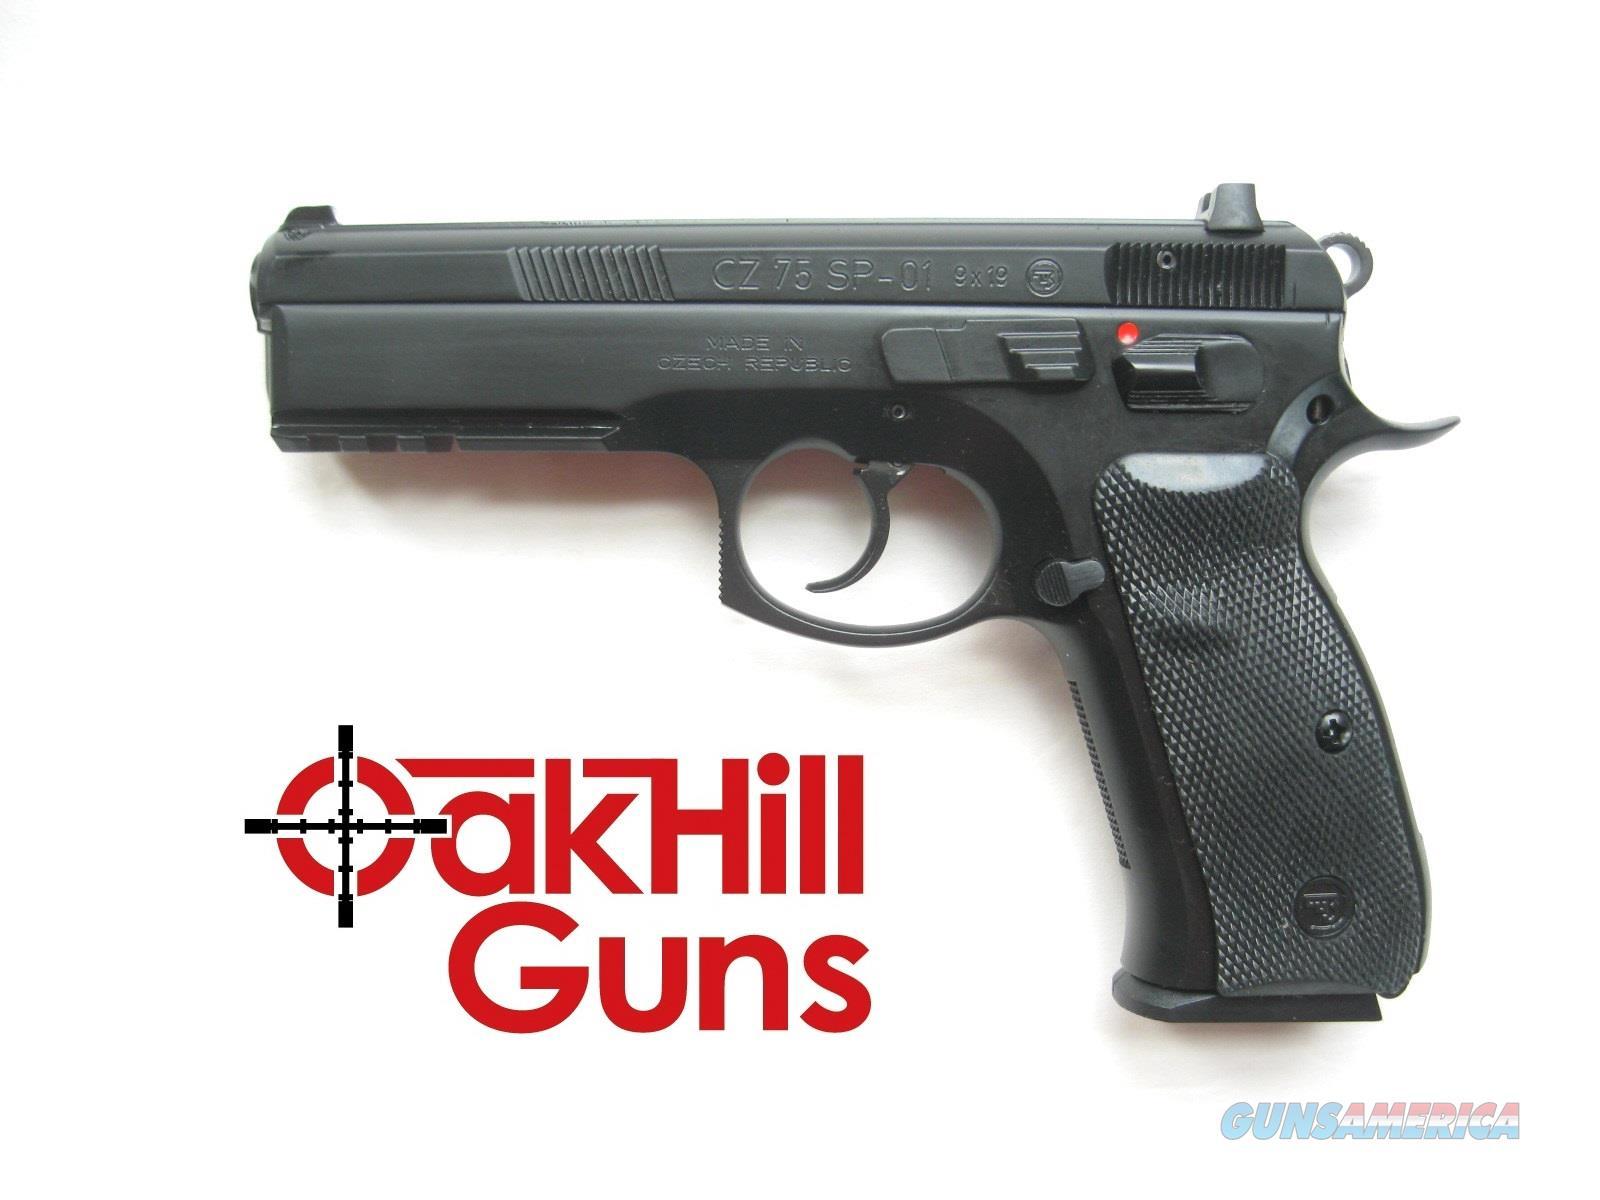 CZ 75 SP-01 9mm TruDot Night Sights 10 Round Mags SP01 01152 *NEW*  Guns > Pistols > CZ Pistols